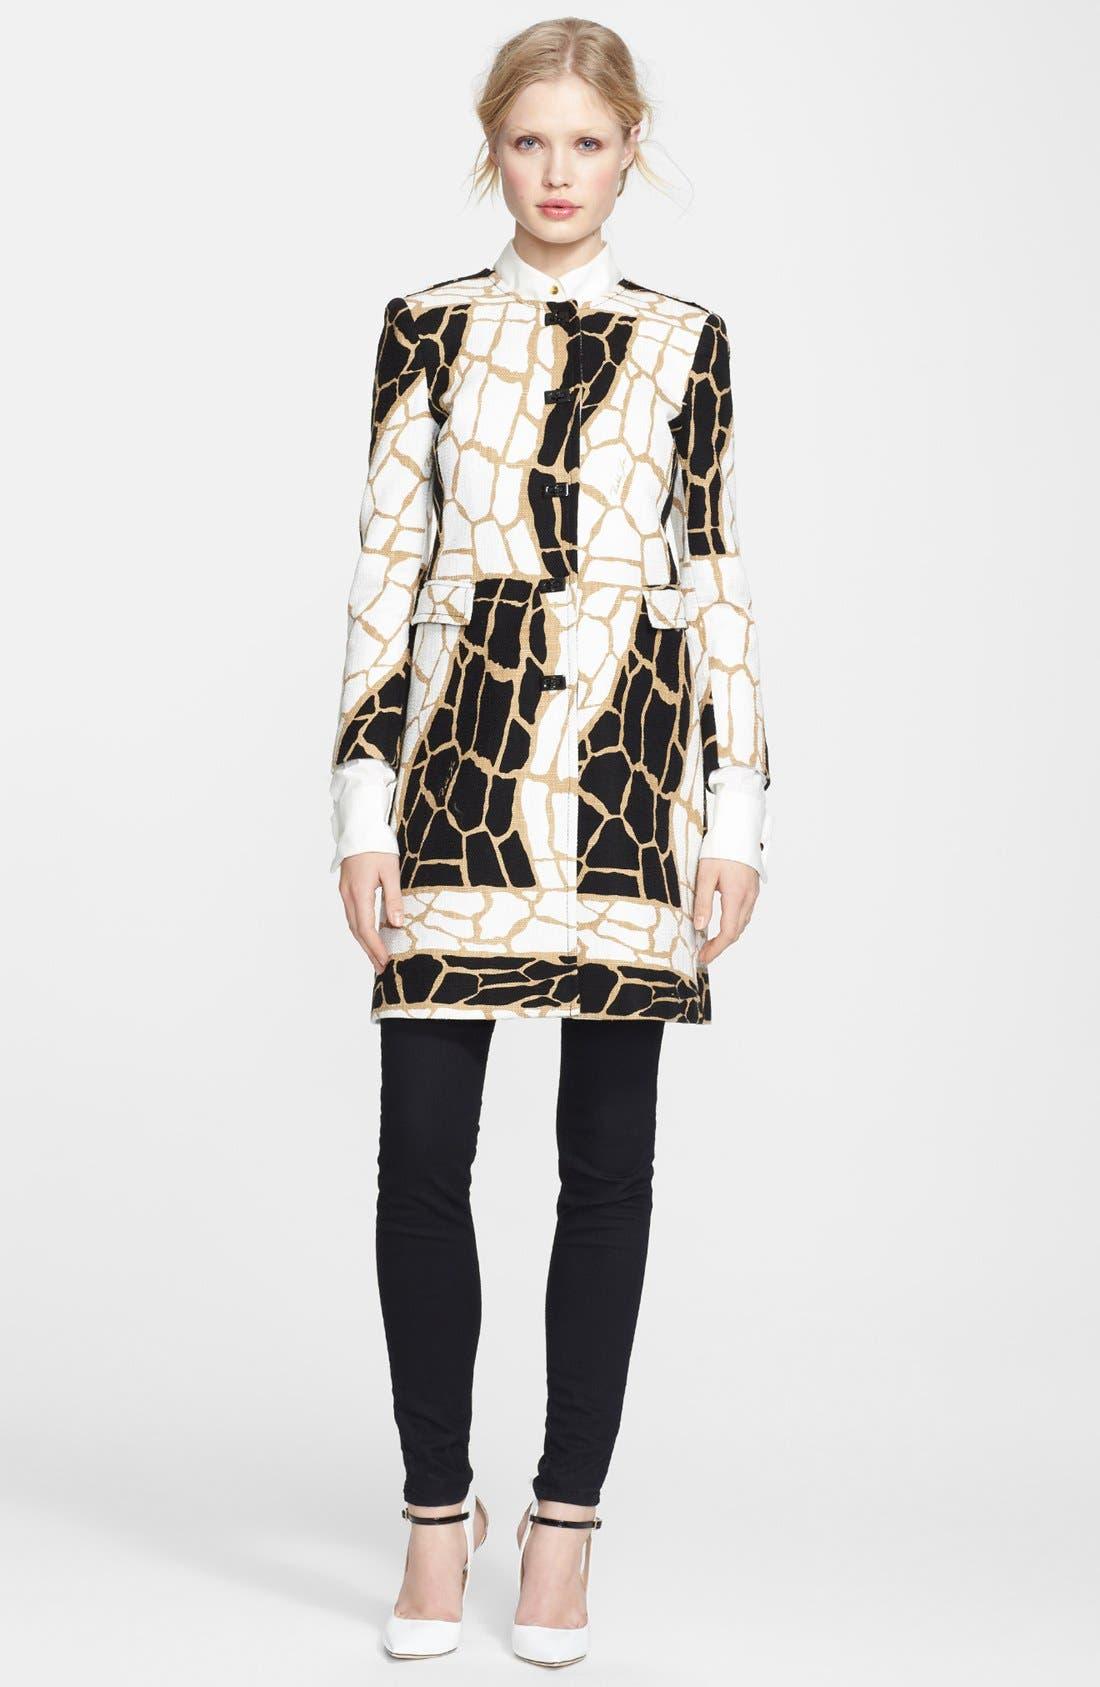 Main Image - Rachel Zoe 'Mena' Giraffe Print Coat